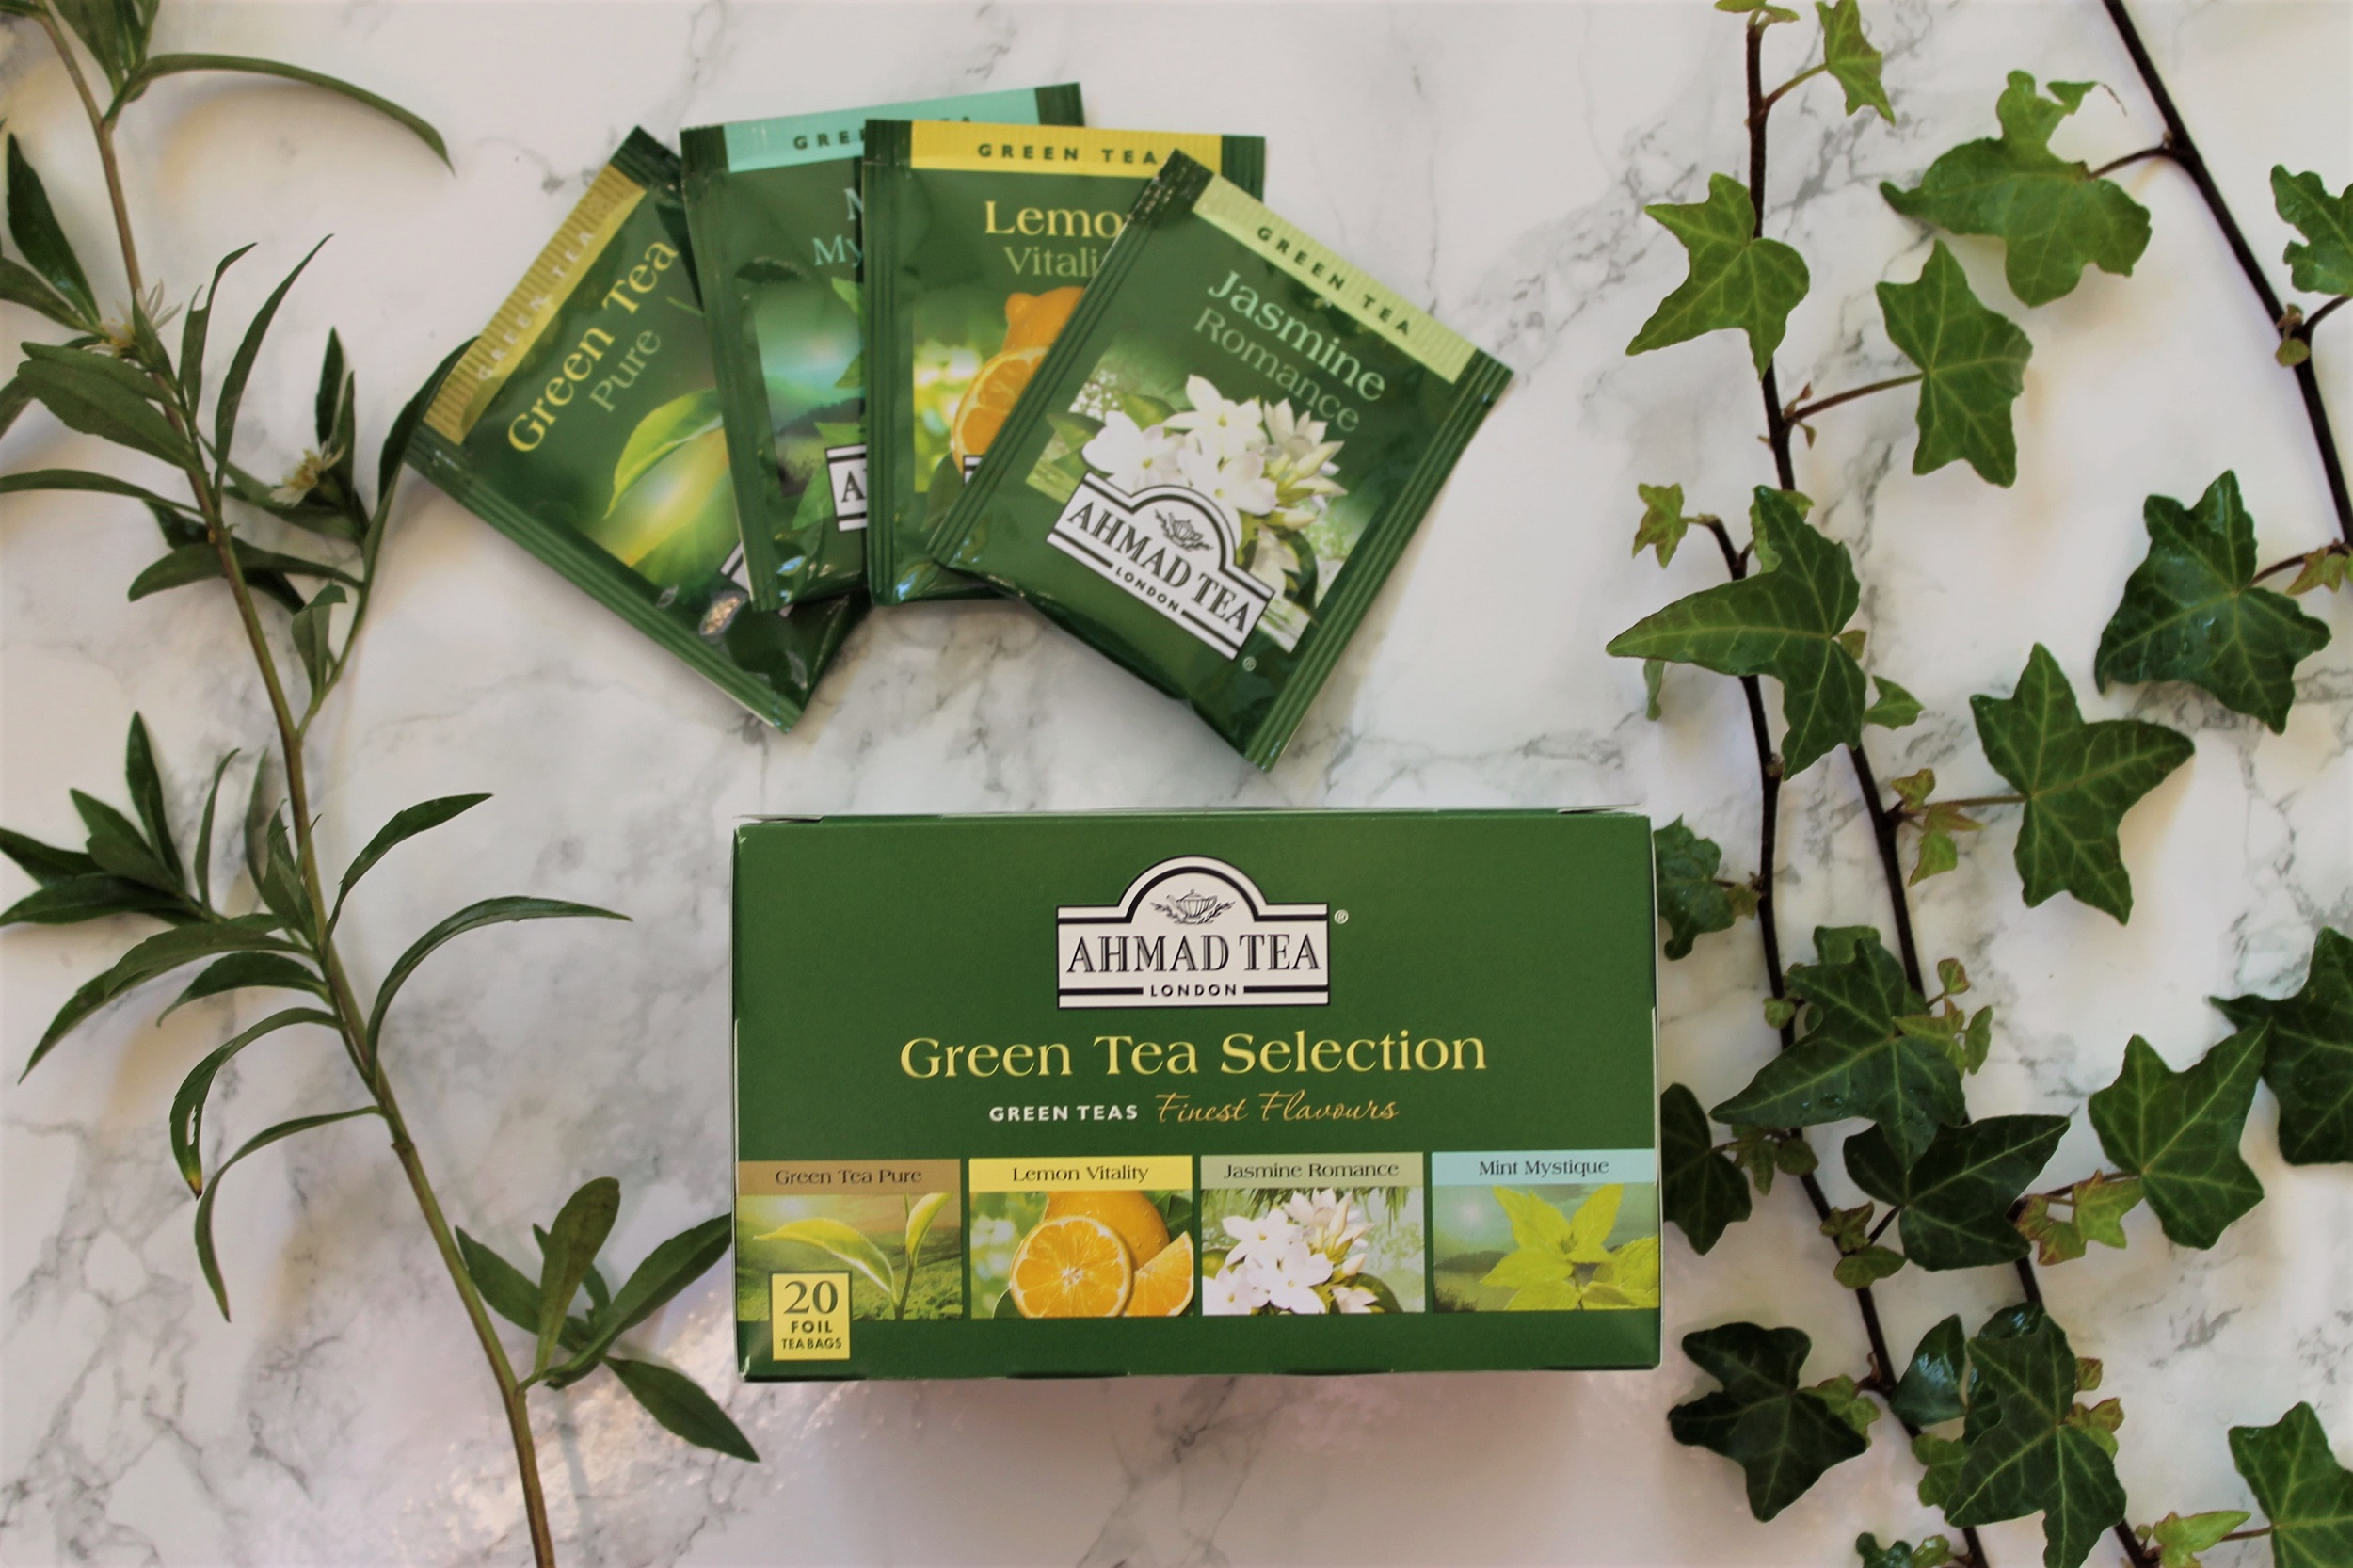 Ahmad Green Tea Selection Box Review